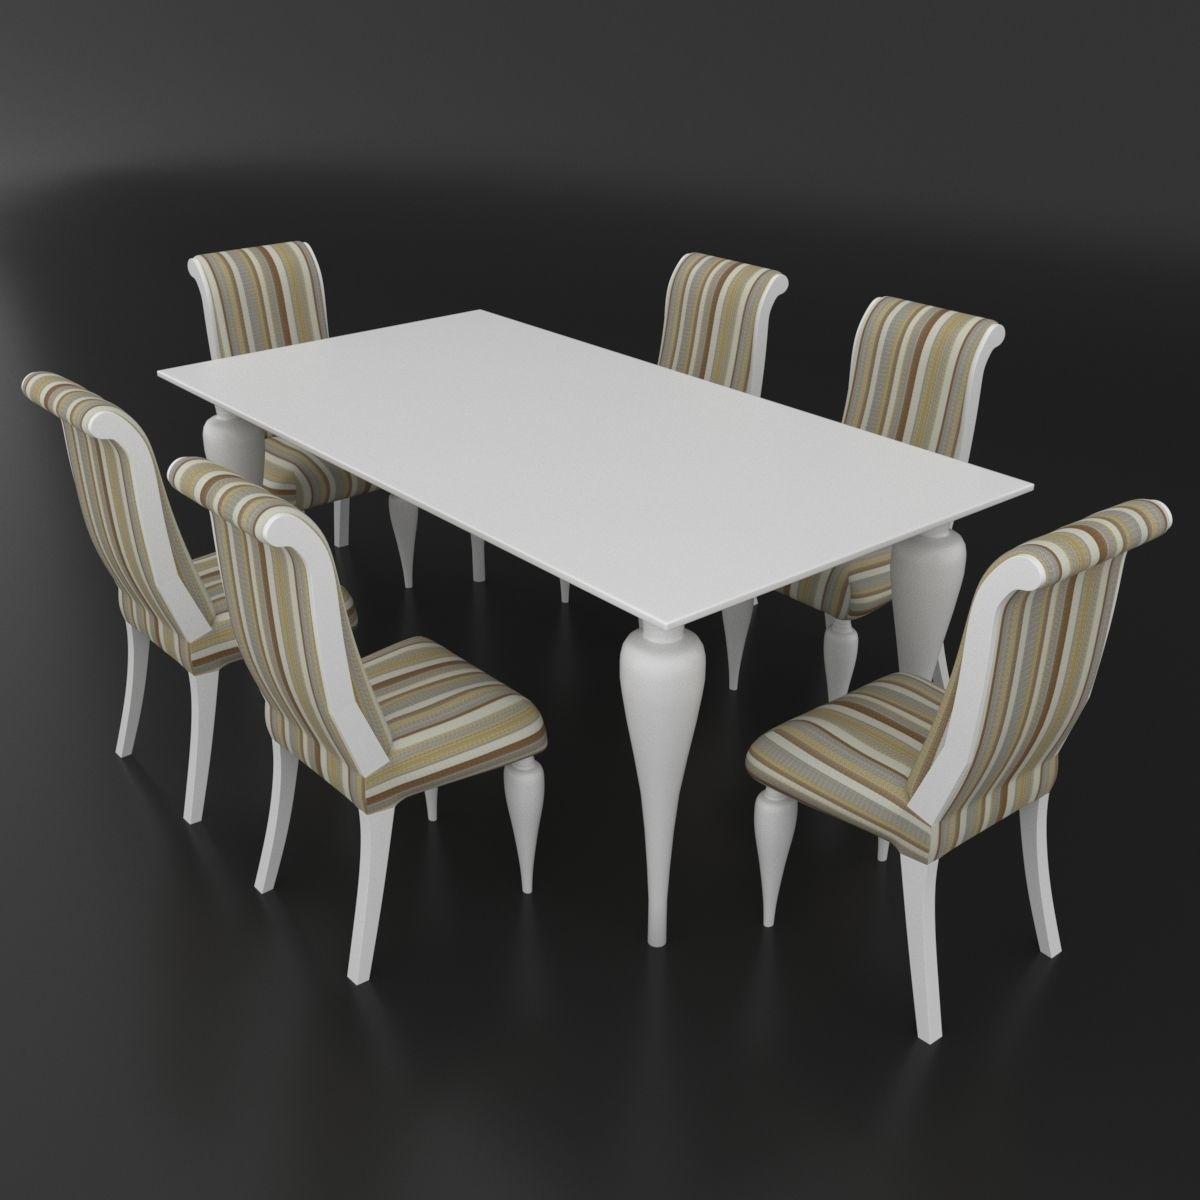 Mobili Design Italiano.Dining Set Of Classical Design Beta Mobili Ottocento Italiano 3d Model